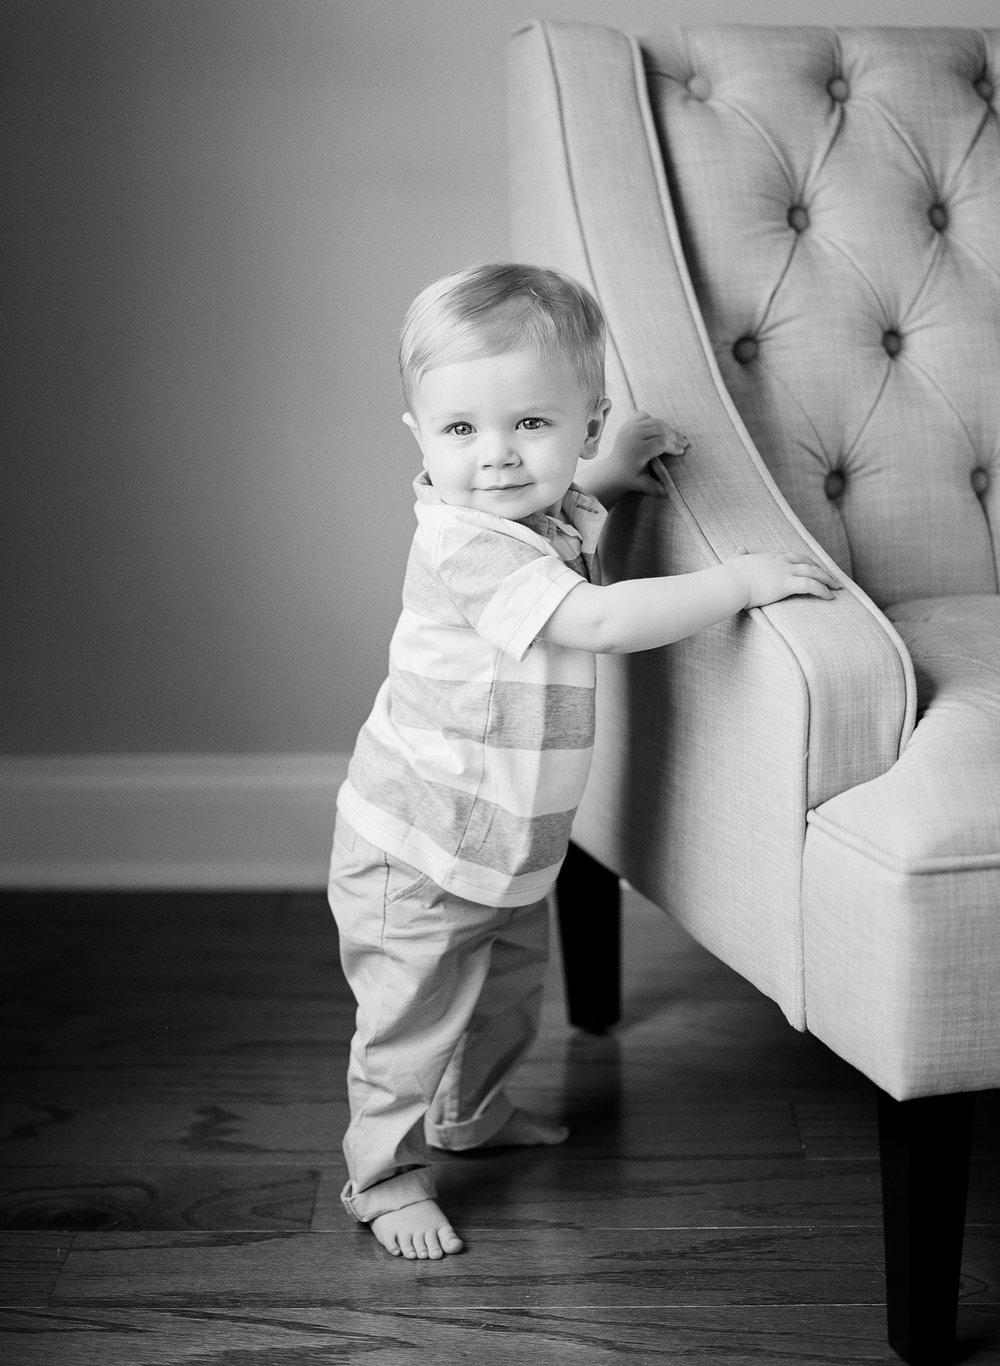 nashville-franklin-blackandwhite-childrens-portraiture-20.JPG